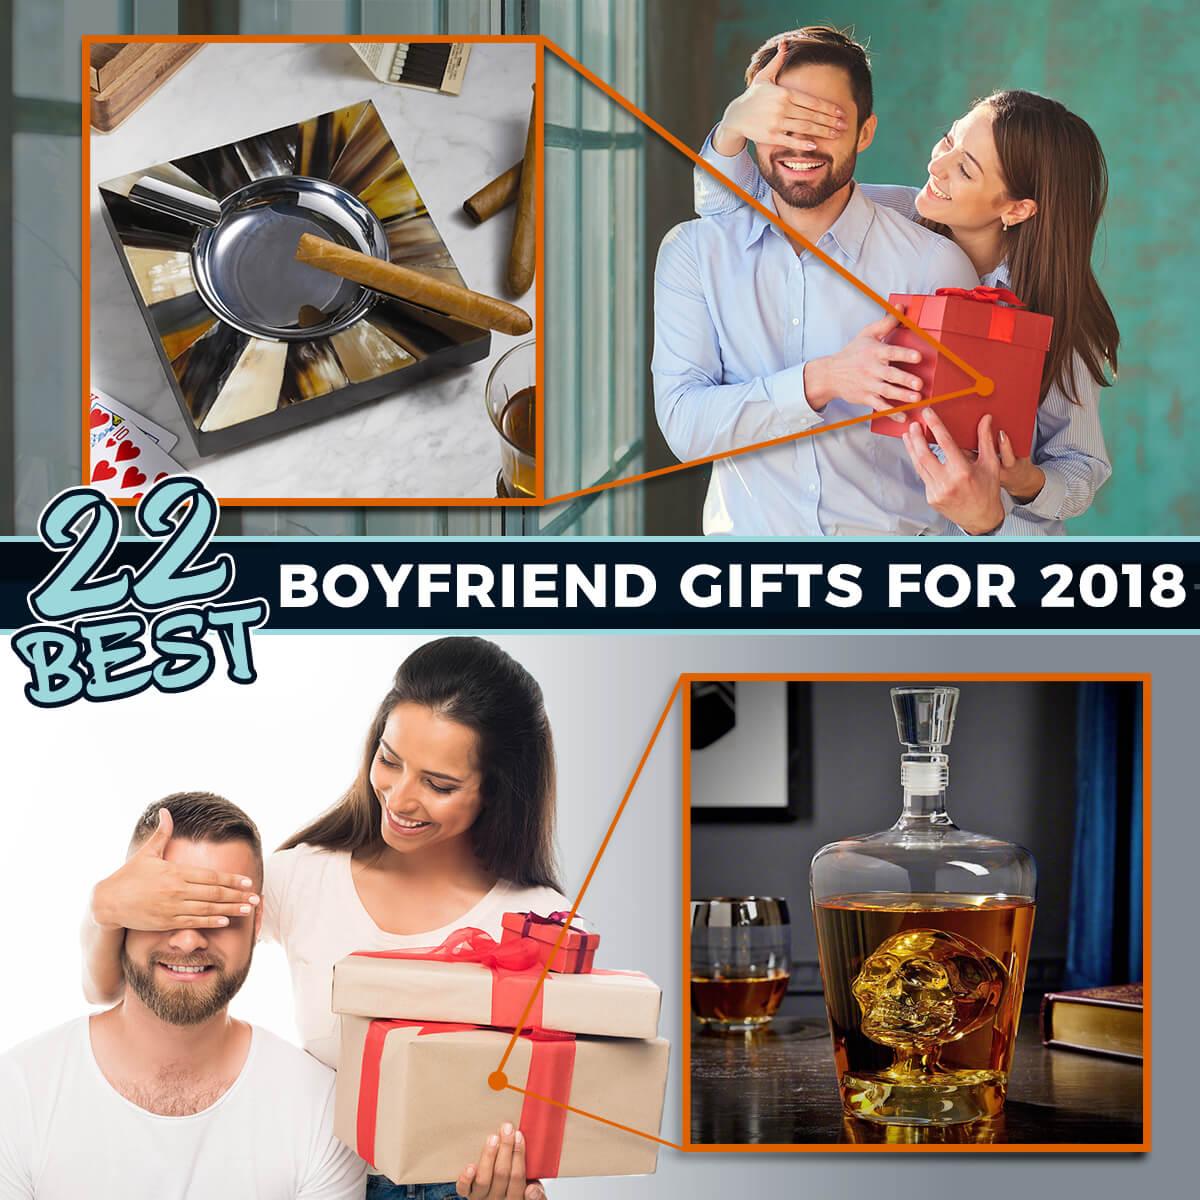 23 Gifts For My Boyfriend S 23rd Birthday: 22 Best Boyfriend Gifts For 2018